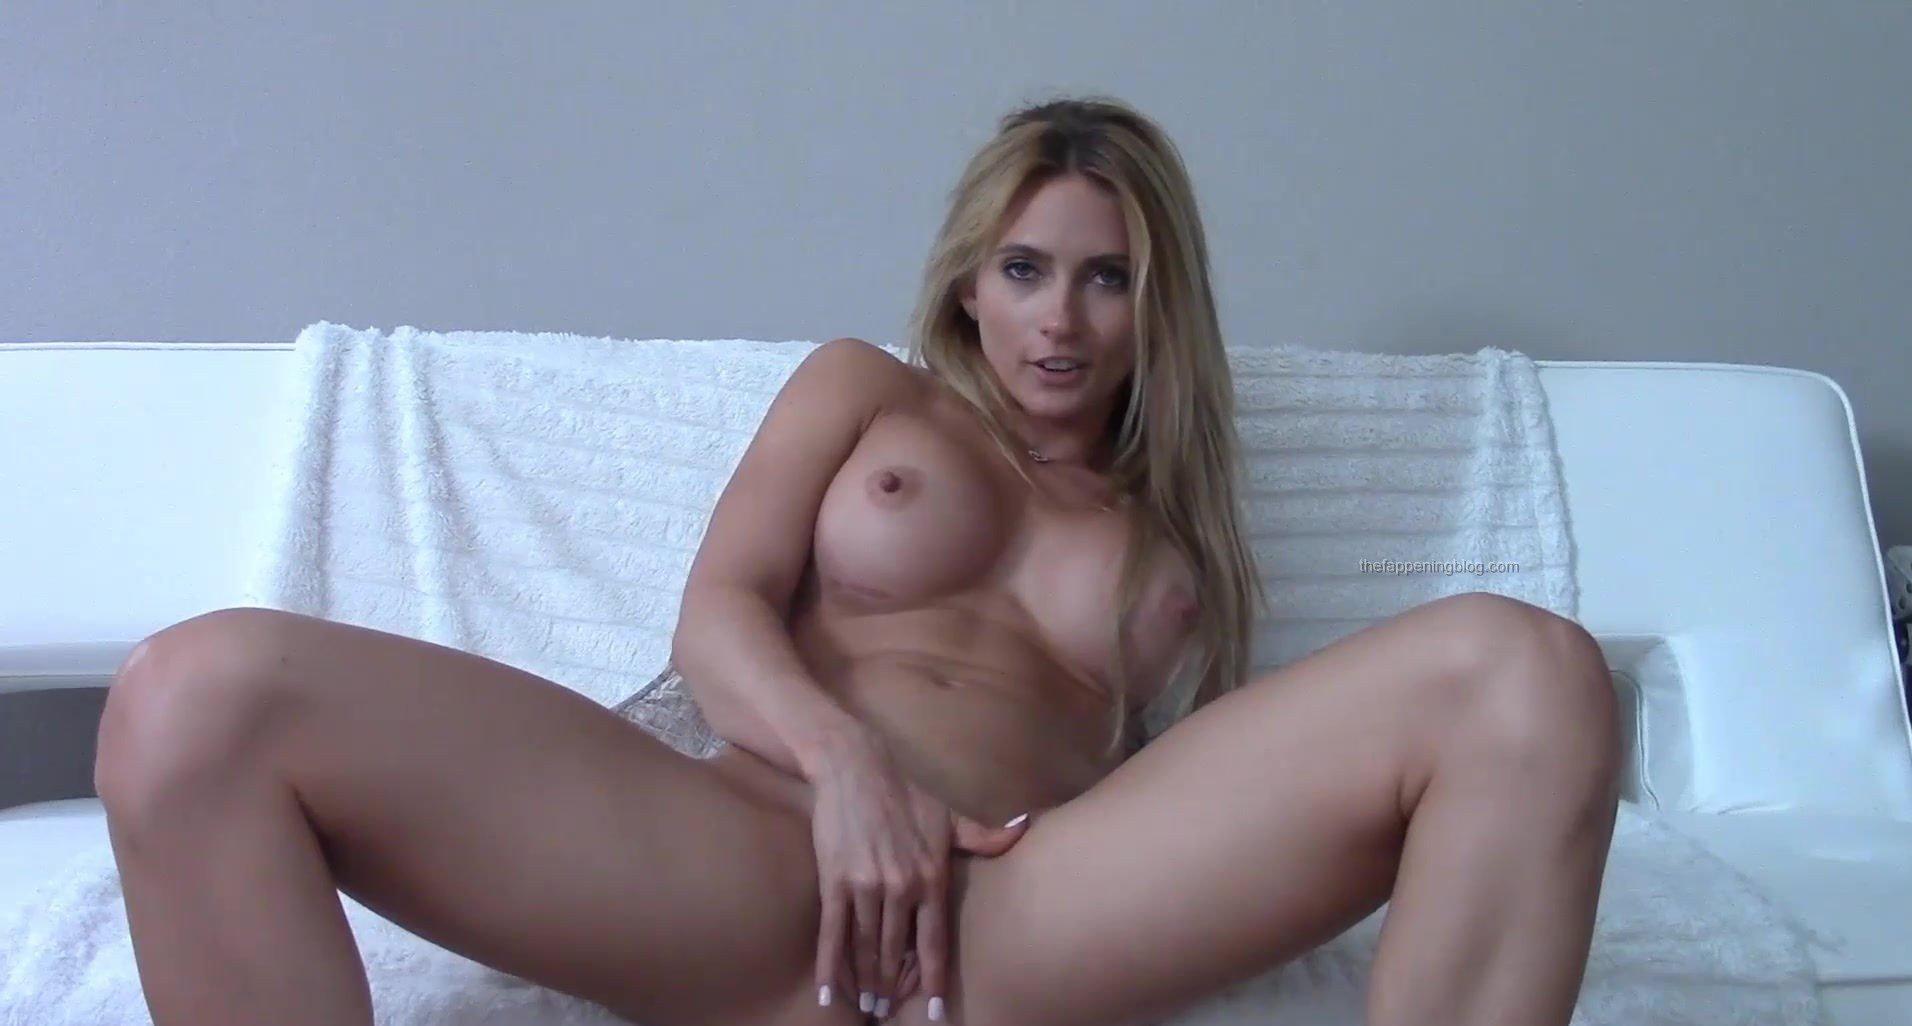 Haley ryder nude